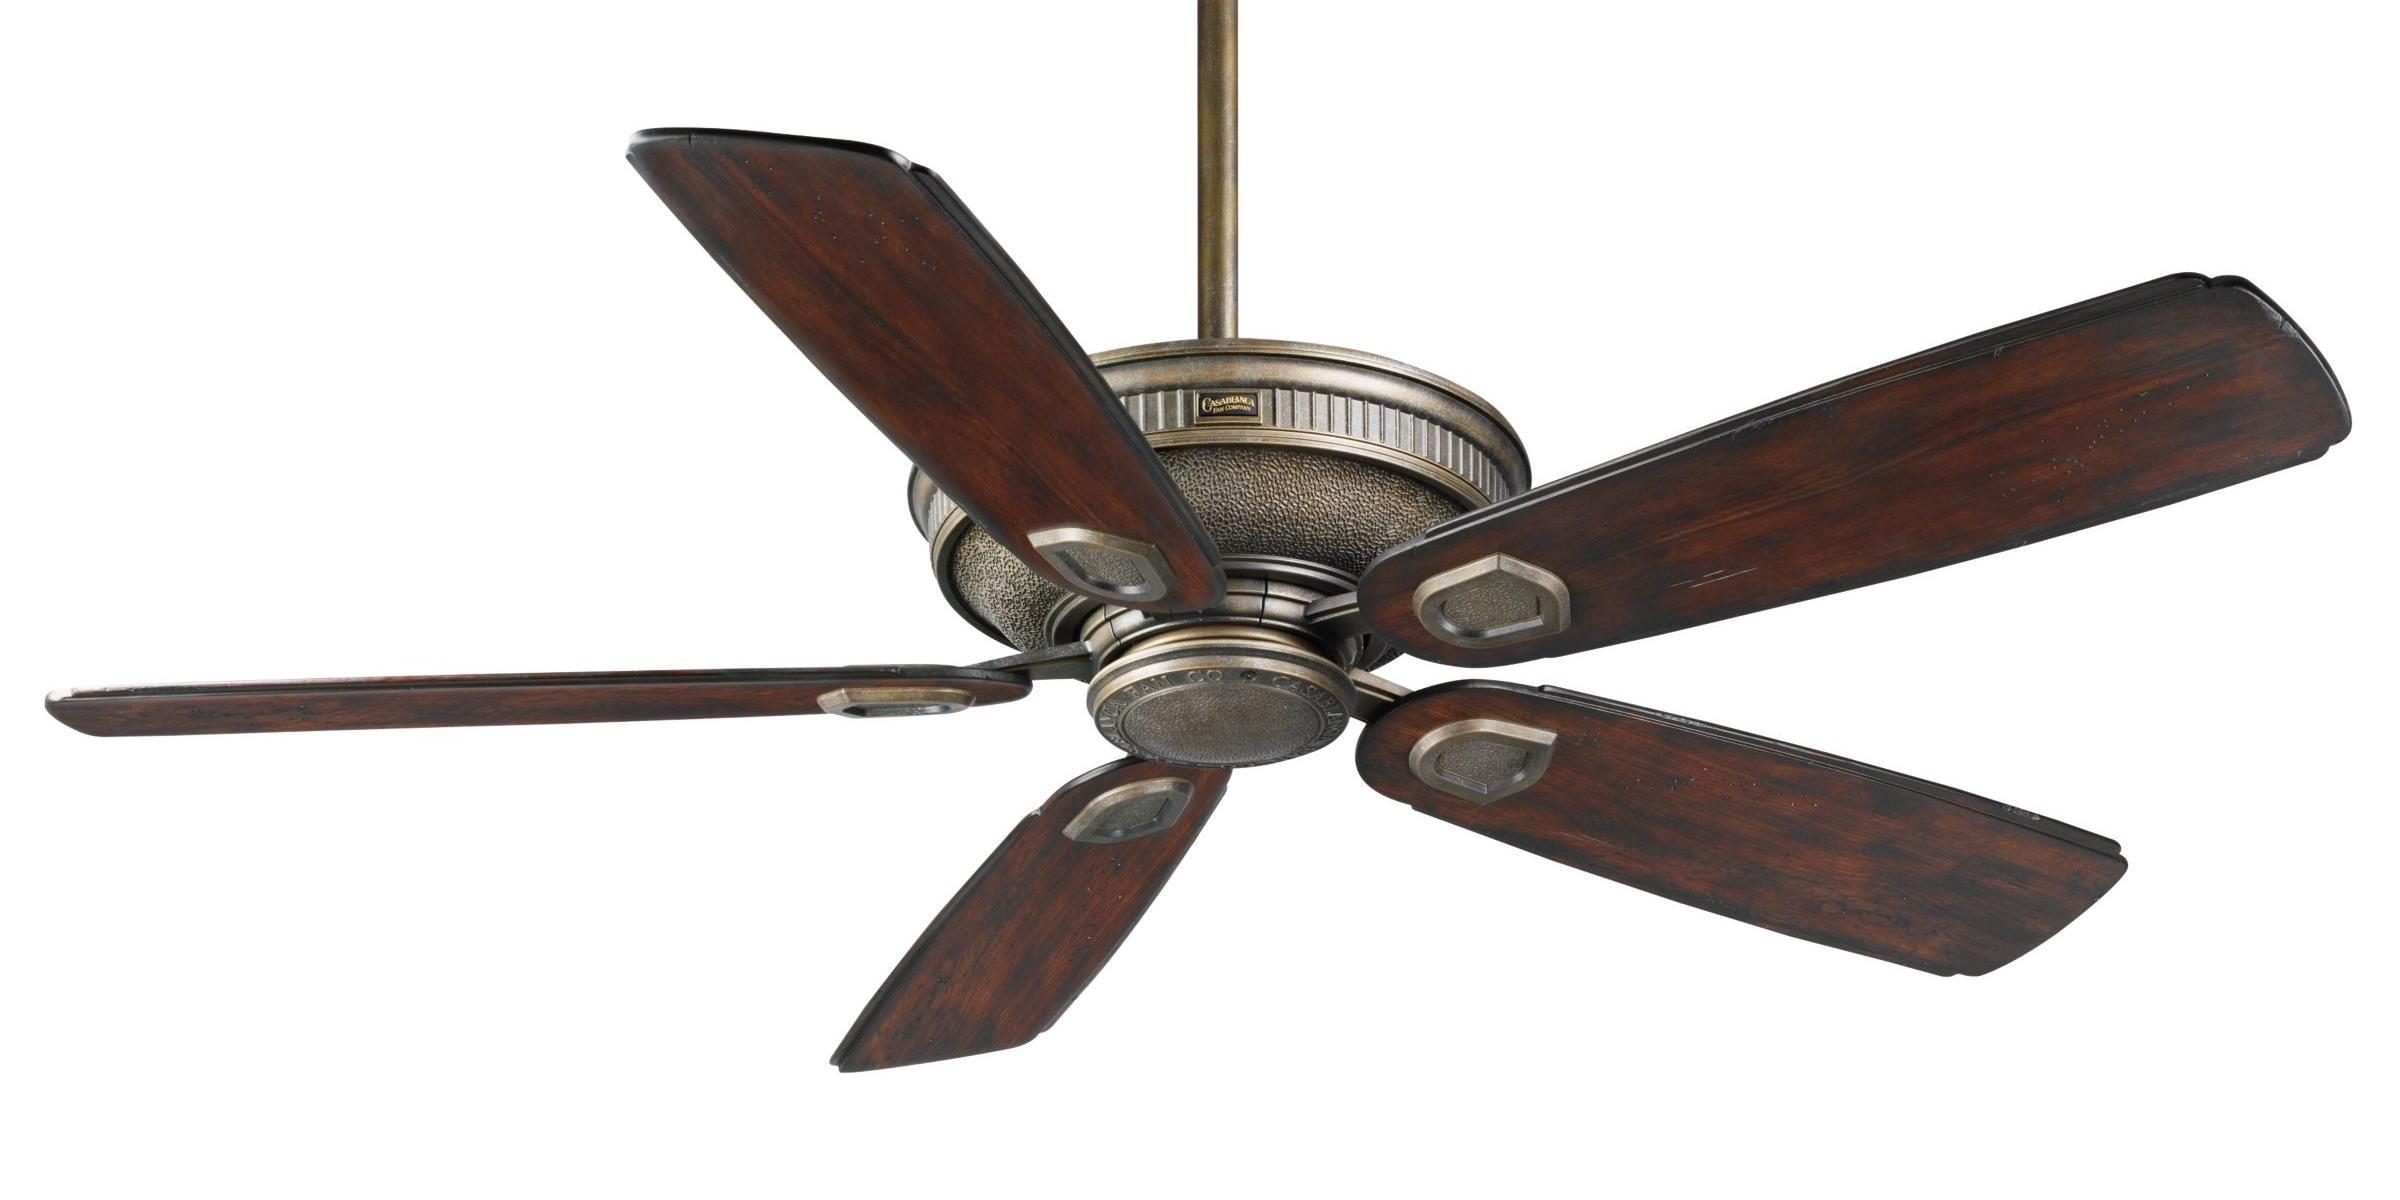 Casablanca Heritage 2014 Ca 59527 Airflow Rating 6865 Cfm Cubic Feet Per Minute Bronze Ceiling Fan Outdoor Ceiling Fans Ceiling Fan High cfm outdoor ceiling fan